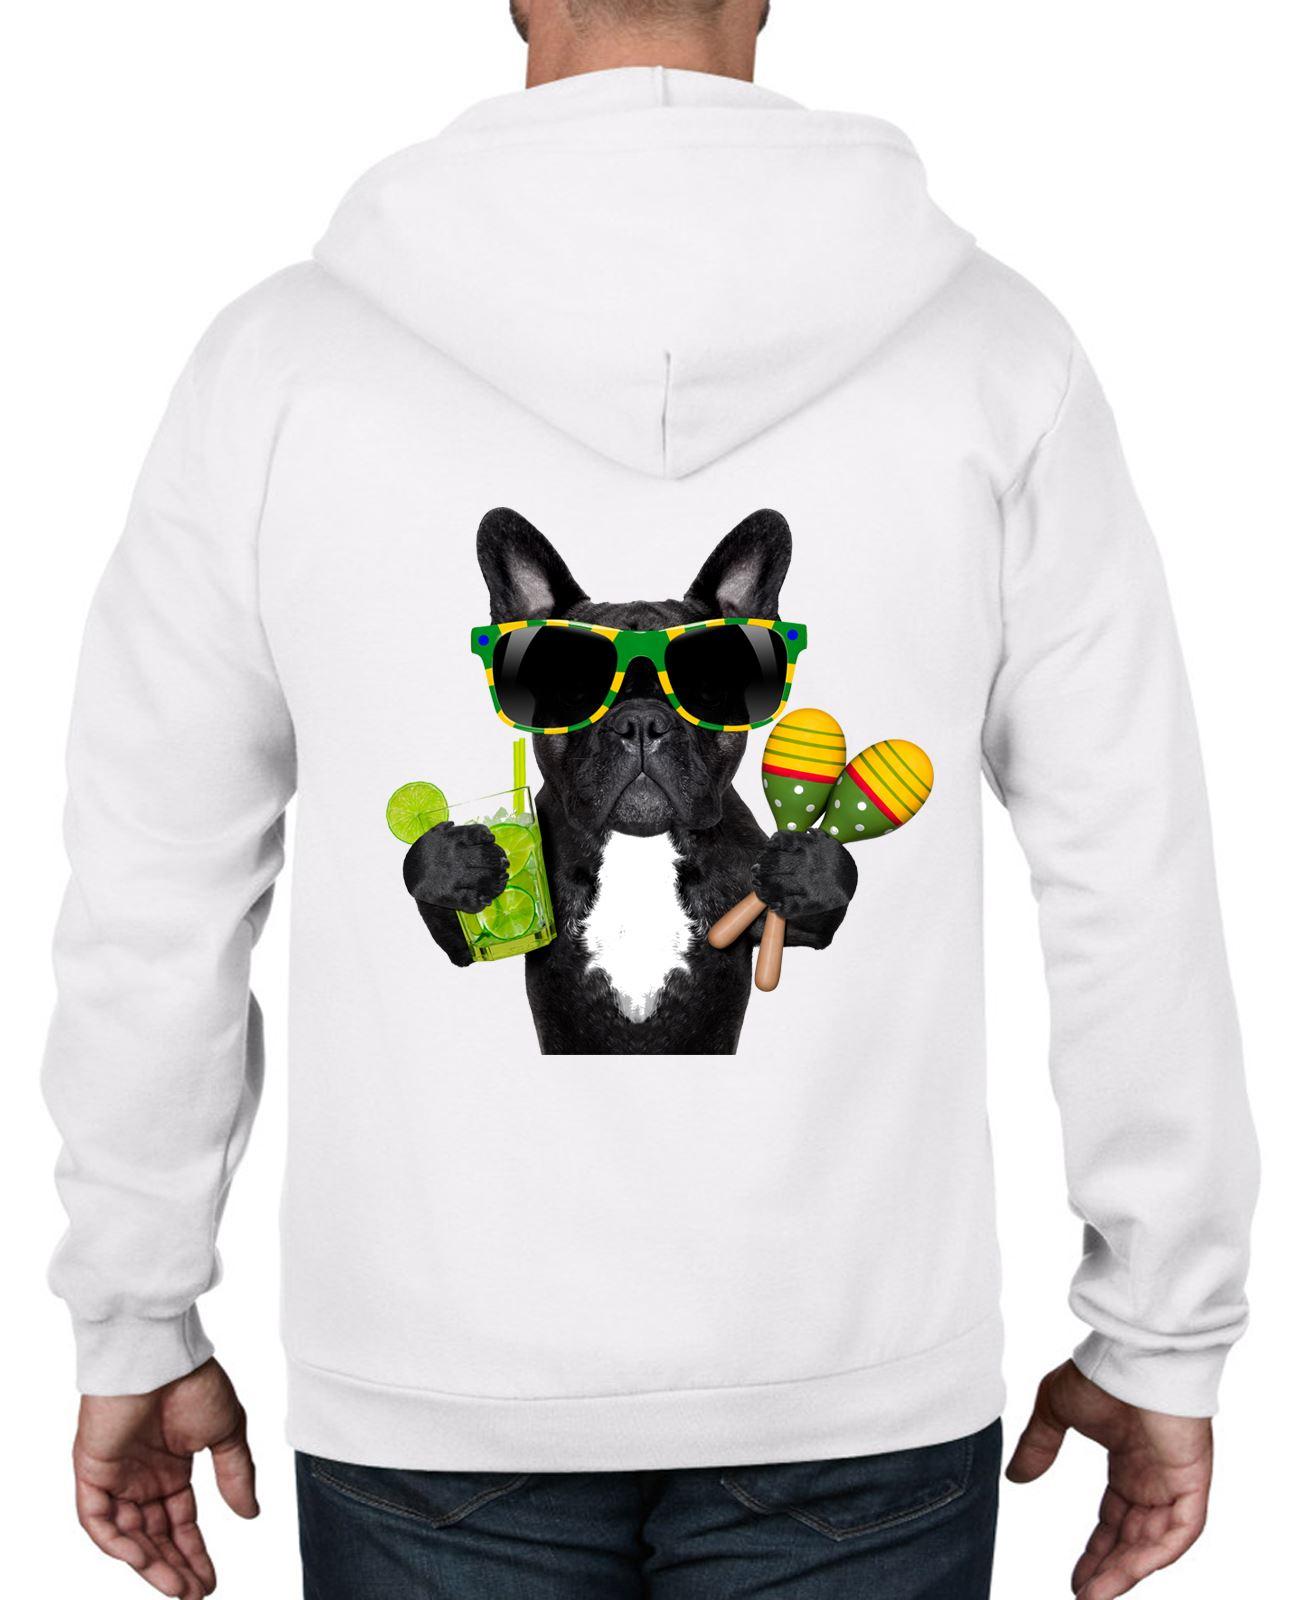 Bulldogs Brazil Funny French Bulldog Brazillian Style Full Zip Hoodie